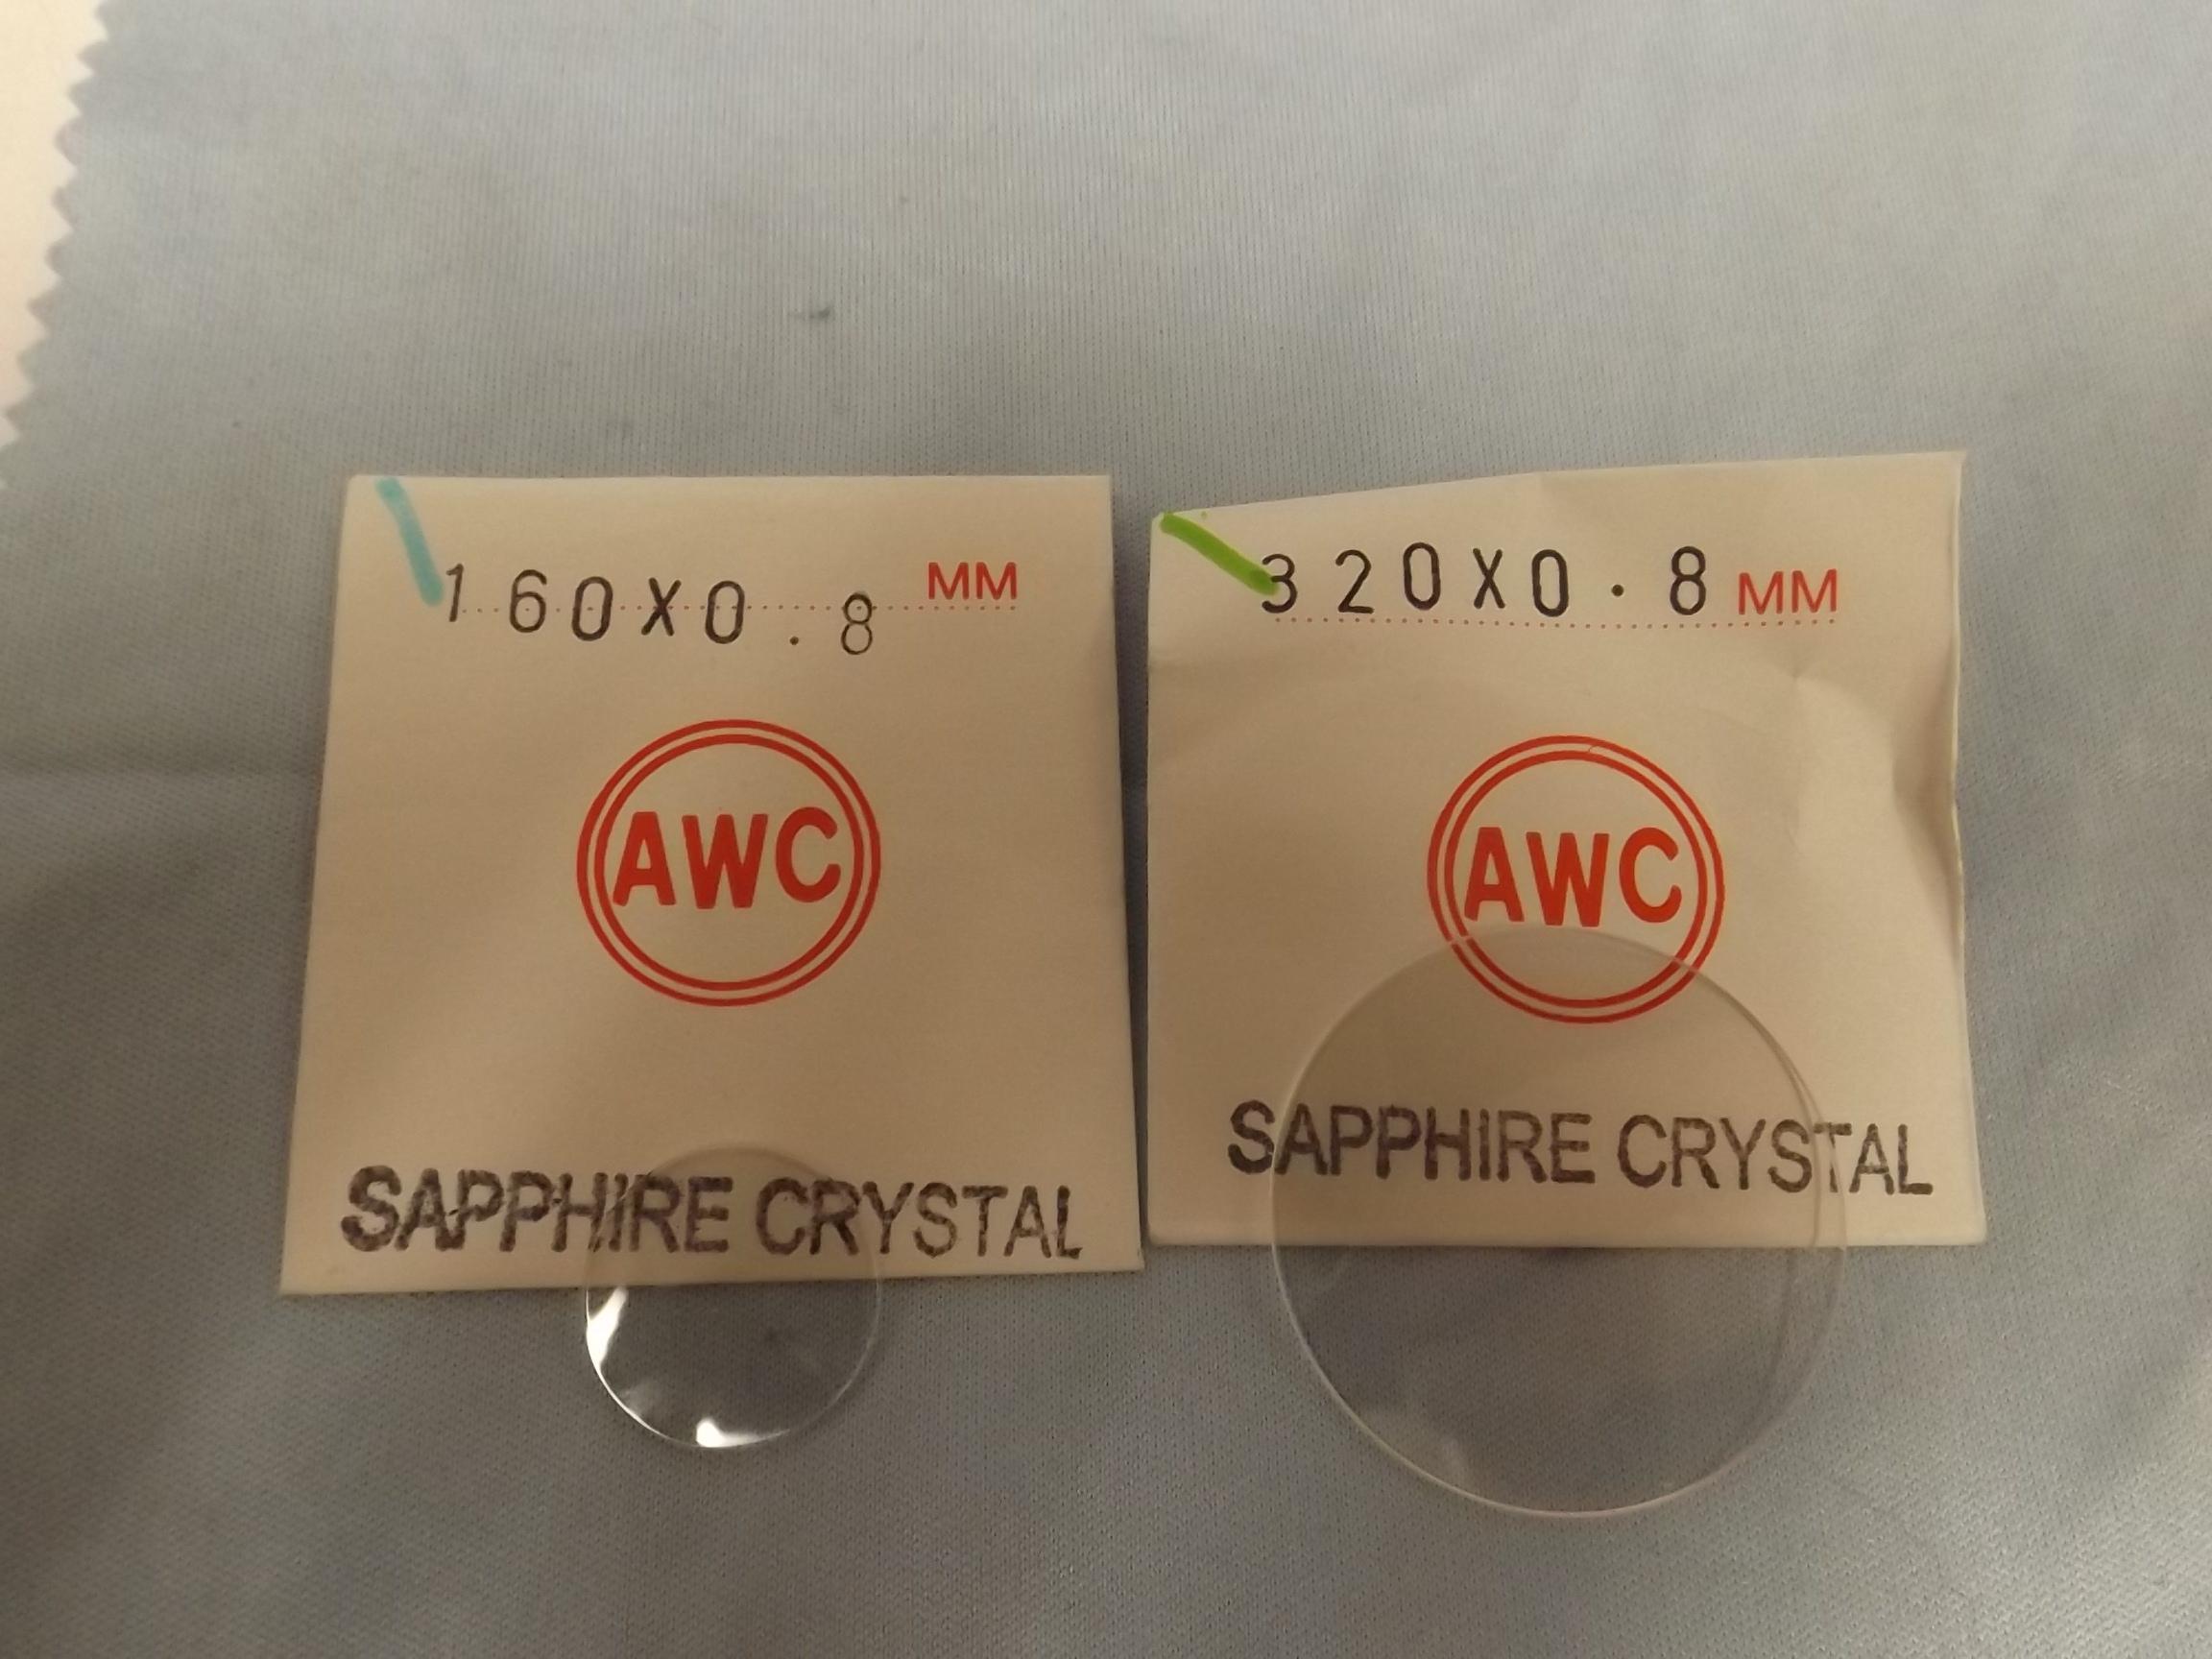 SAP 16.0-32.0MM/ .8MM Sapphire Watch Crystals-- choose MM size